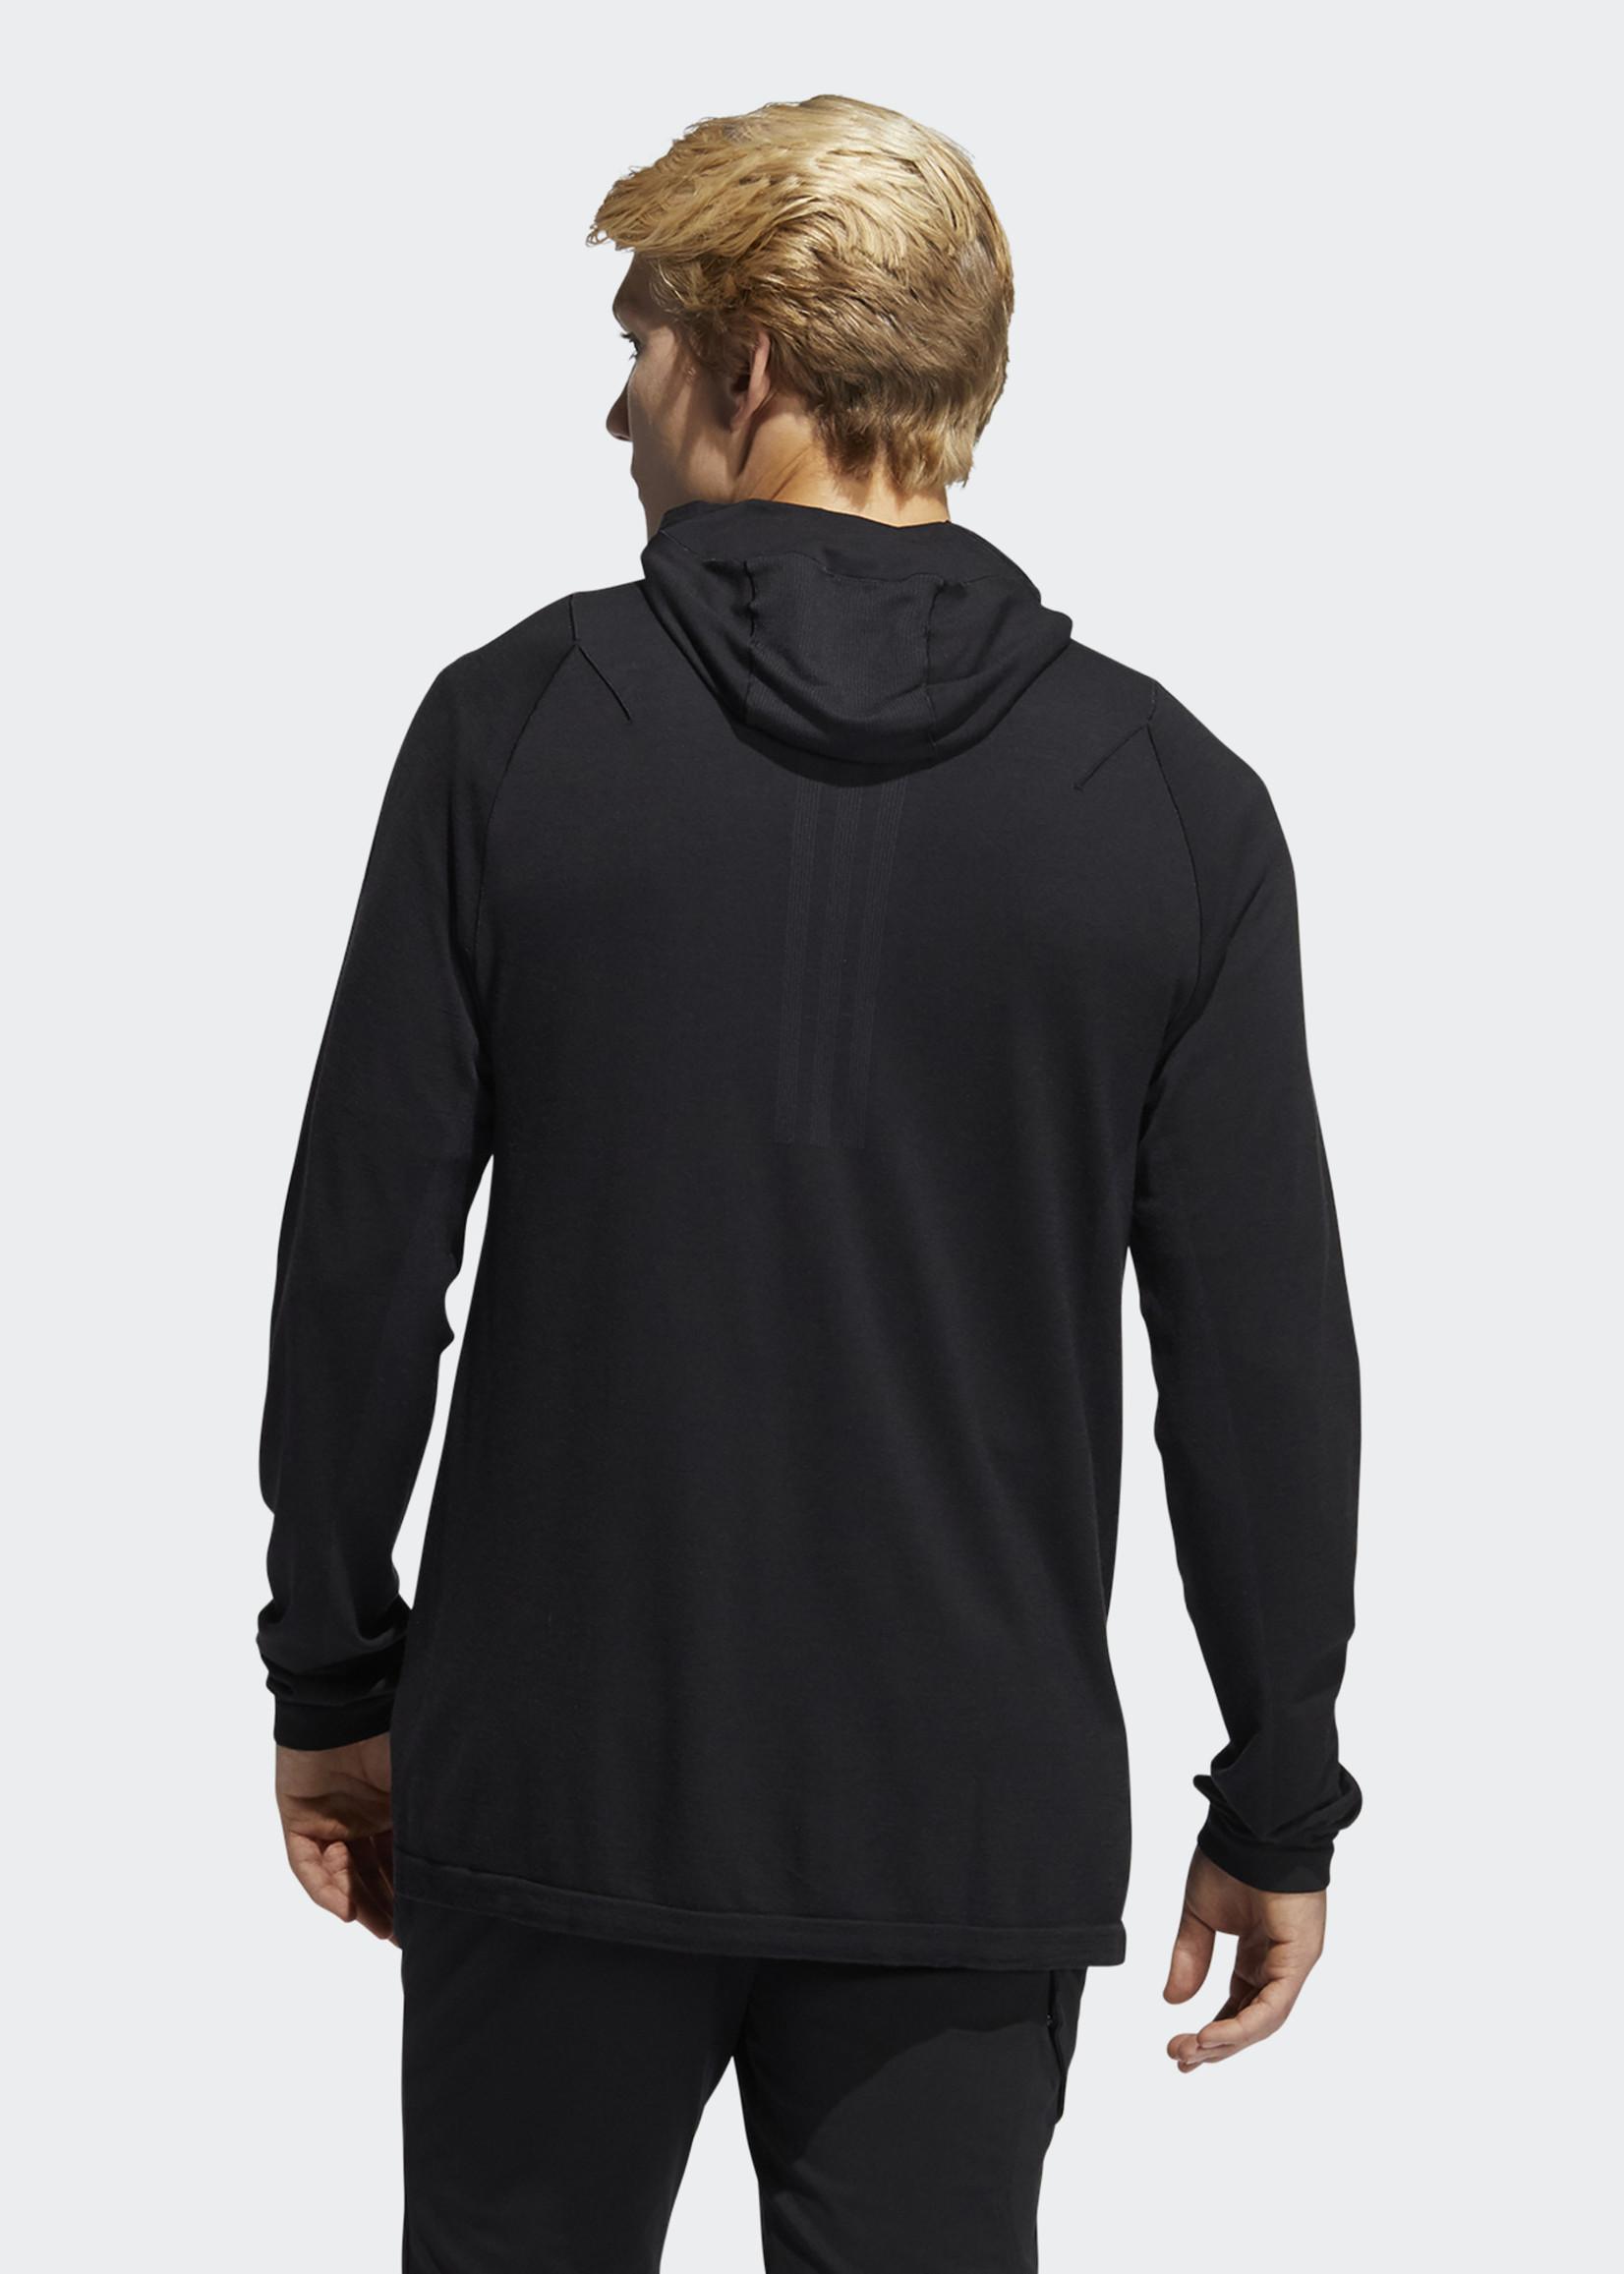 Adidas PRIMEKNIT HOODY BLACK